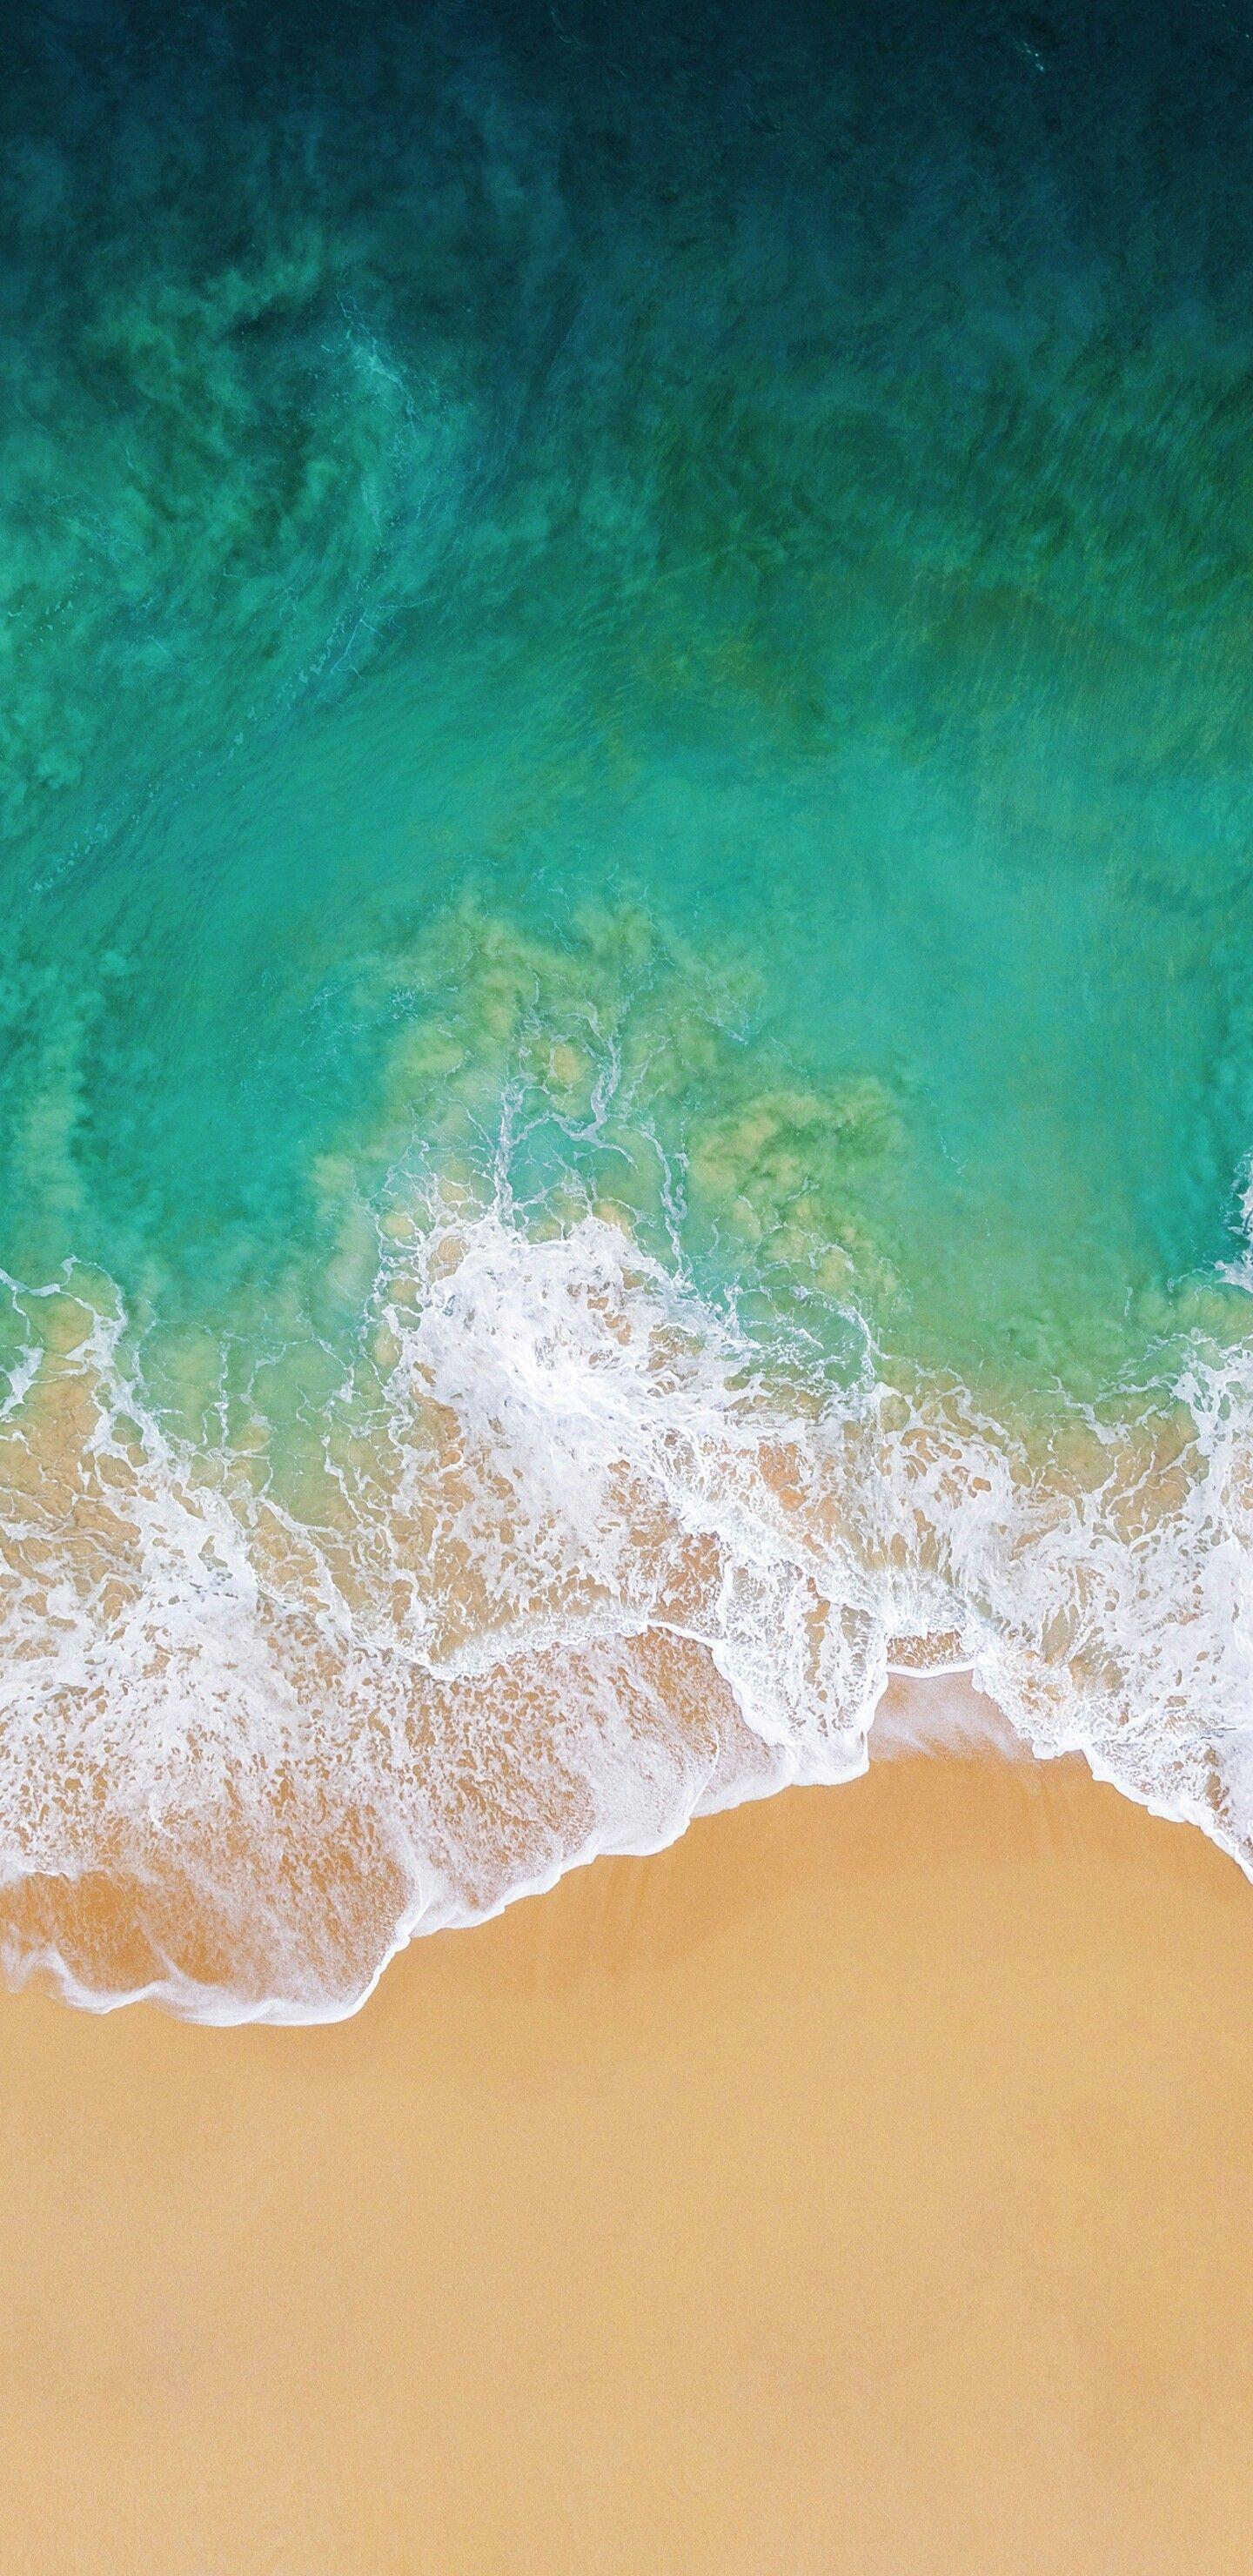 Ios 11 Wallpaper Iphone Xs Max 1440x2960 Download Hd Wallpaper Wallpapertip